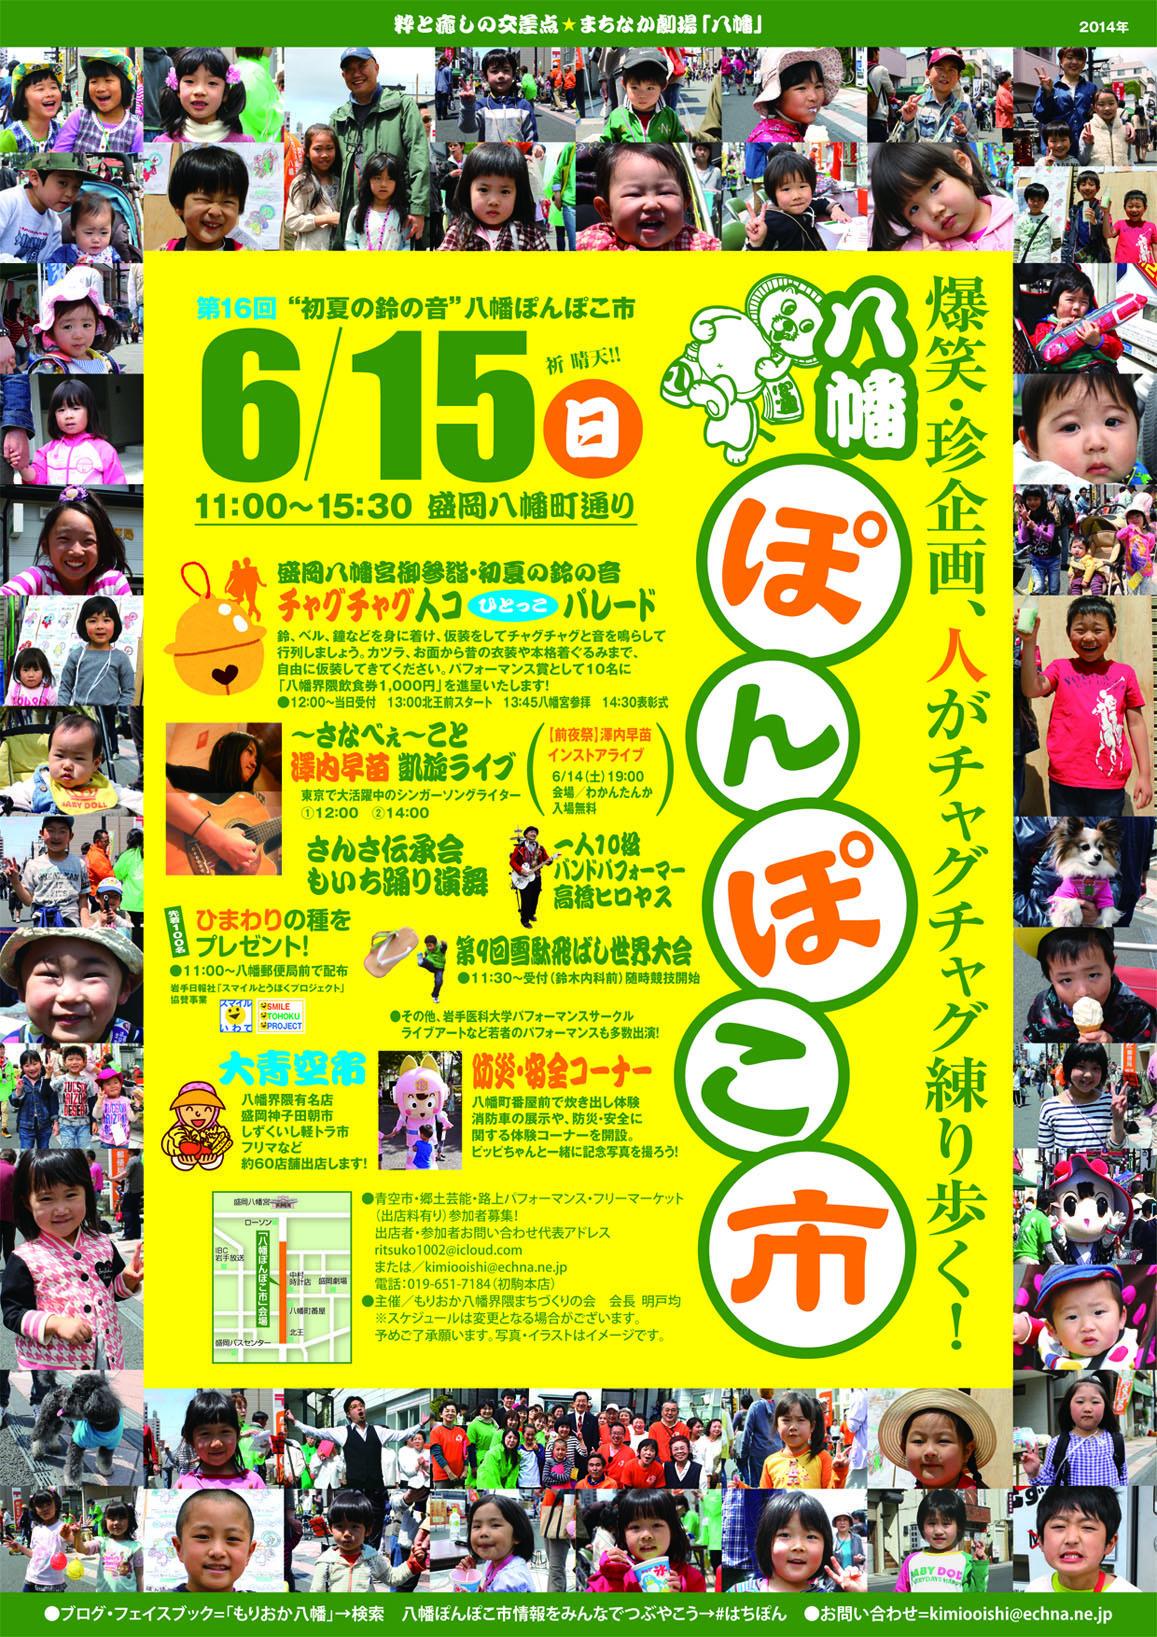 2014615A46.jpg